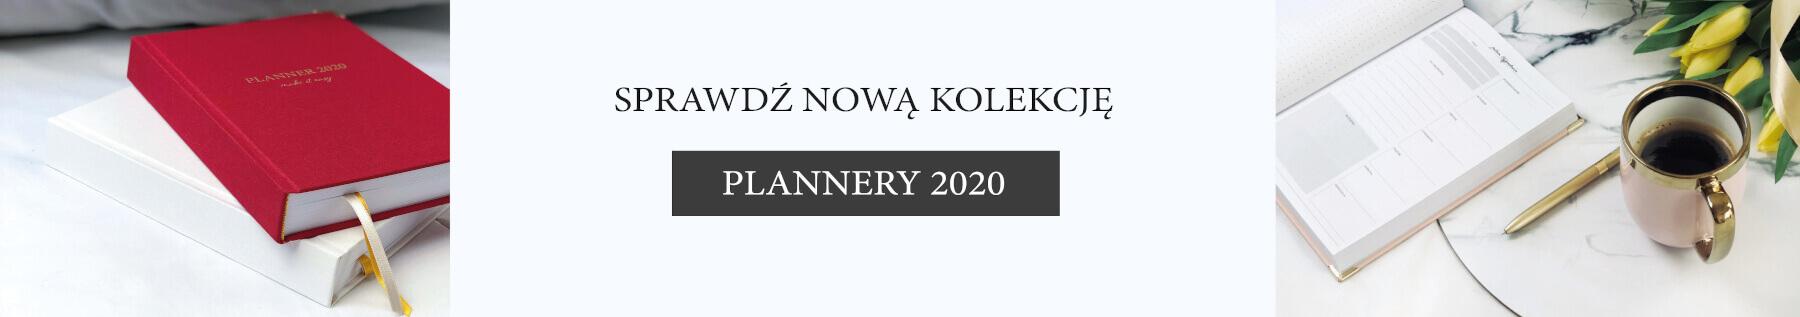 baner planery 2020